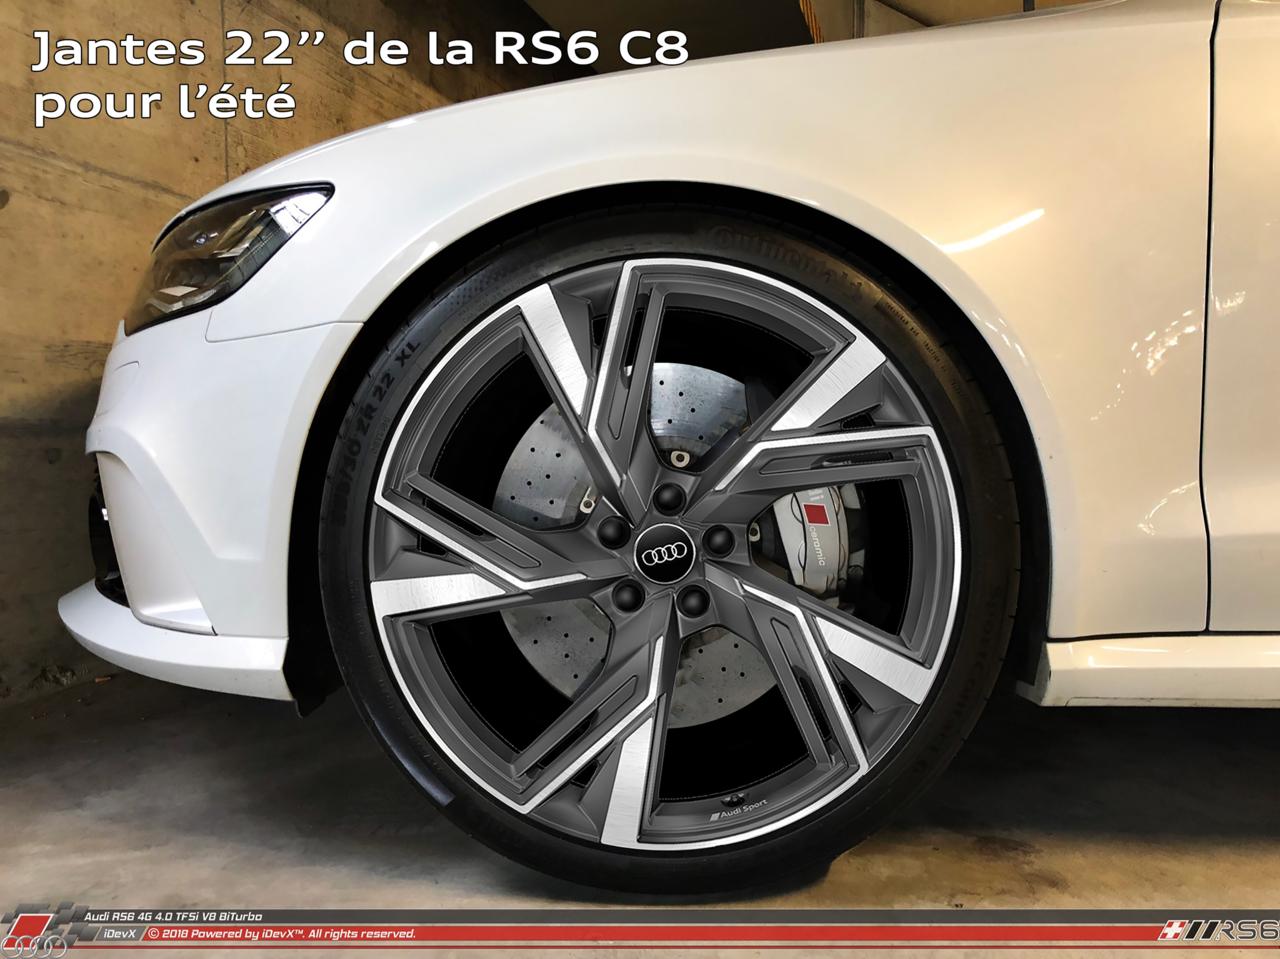 iDevX_Audi-RS6_Test_PM-Jantes4K-22inch_001.png